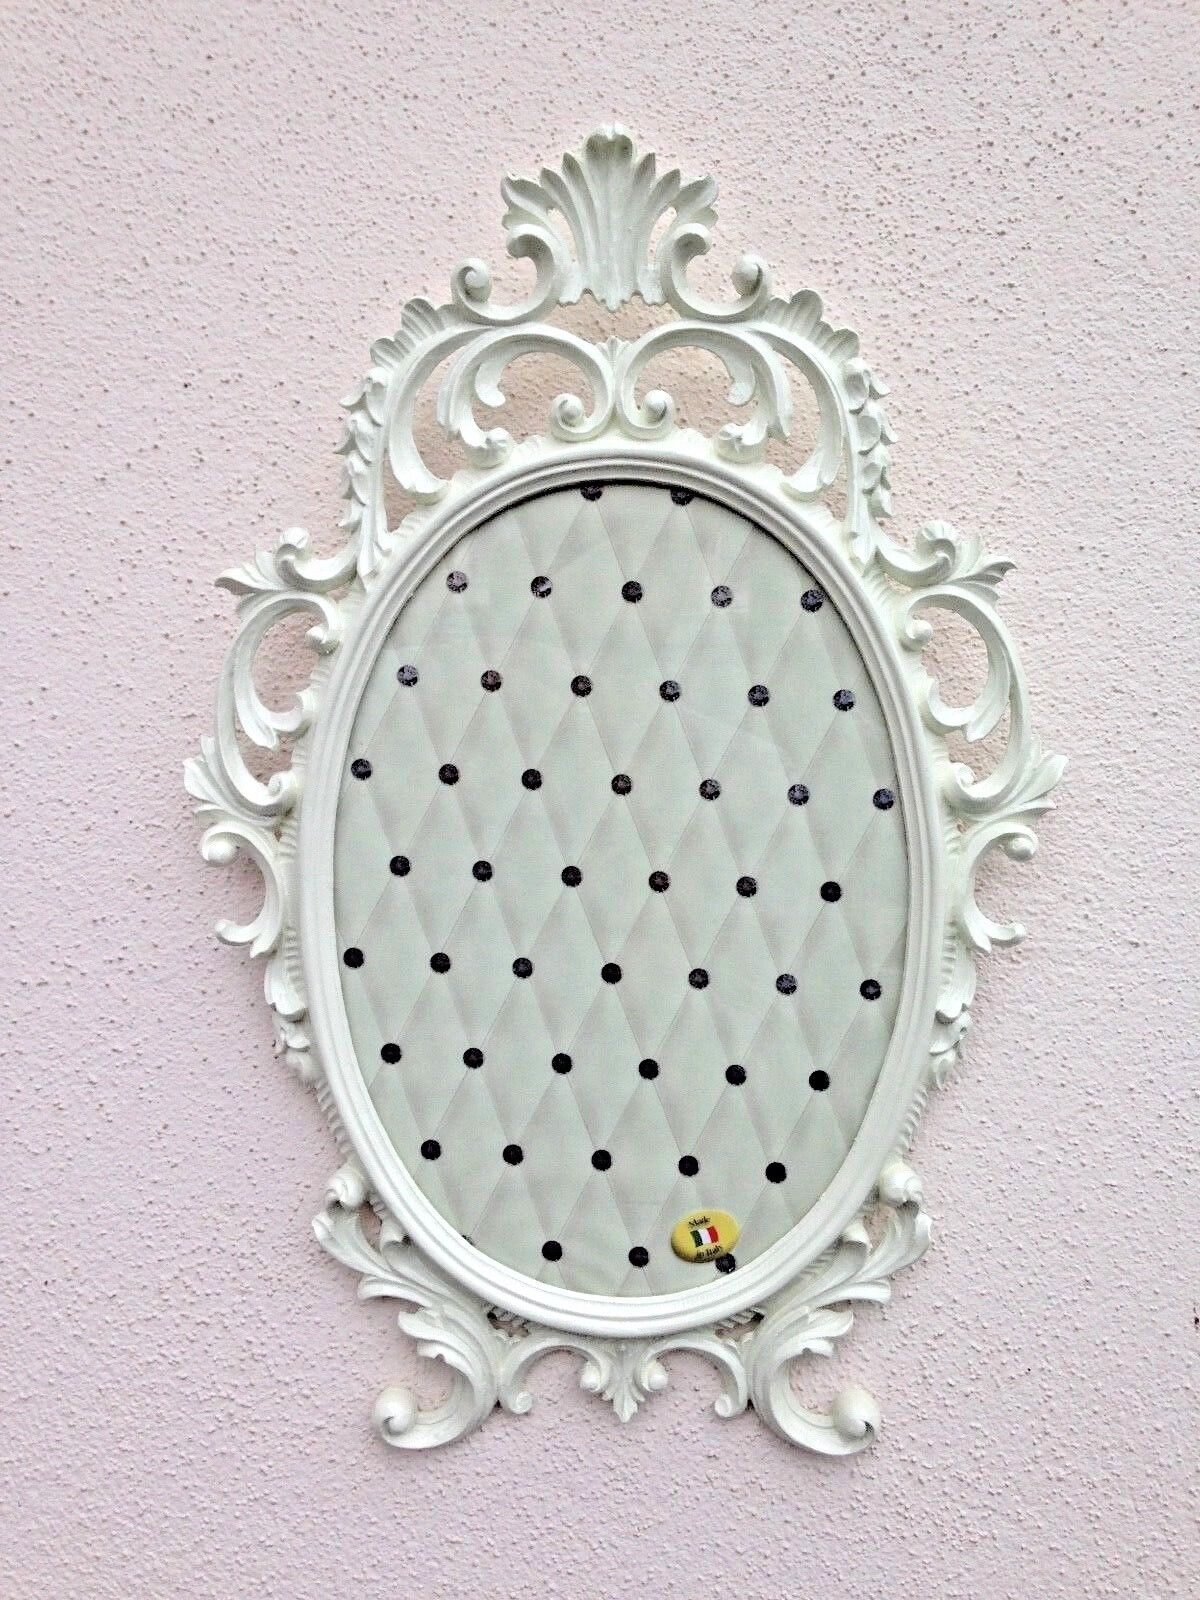 Jugendstil Bilderrahmen Fotorahmen Antik Stil 10x15 Farbe Gold Rahmen Oval